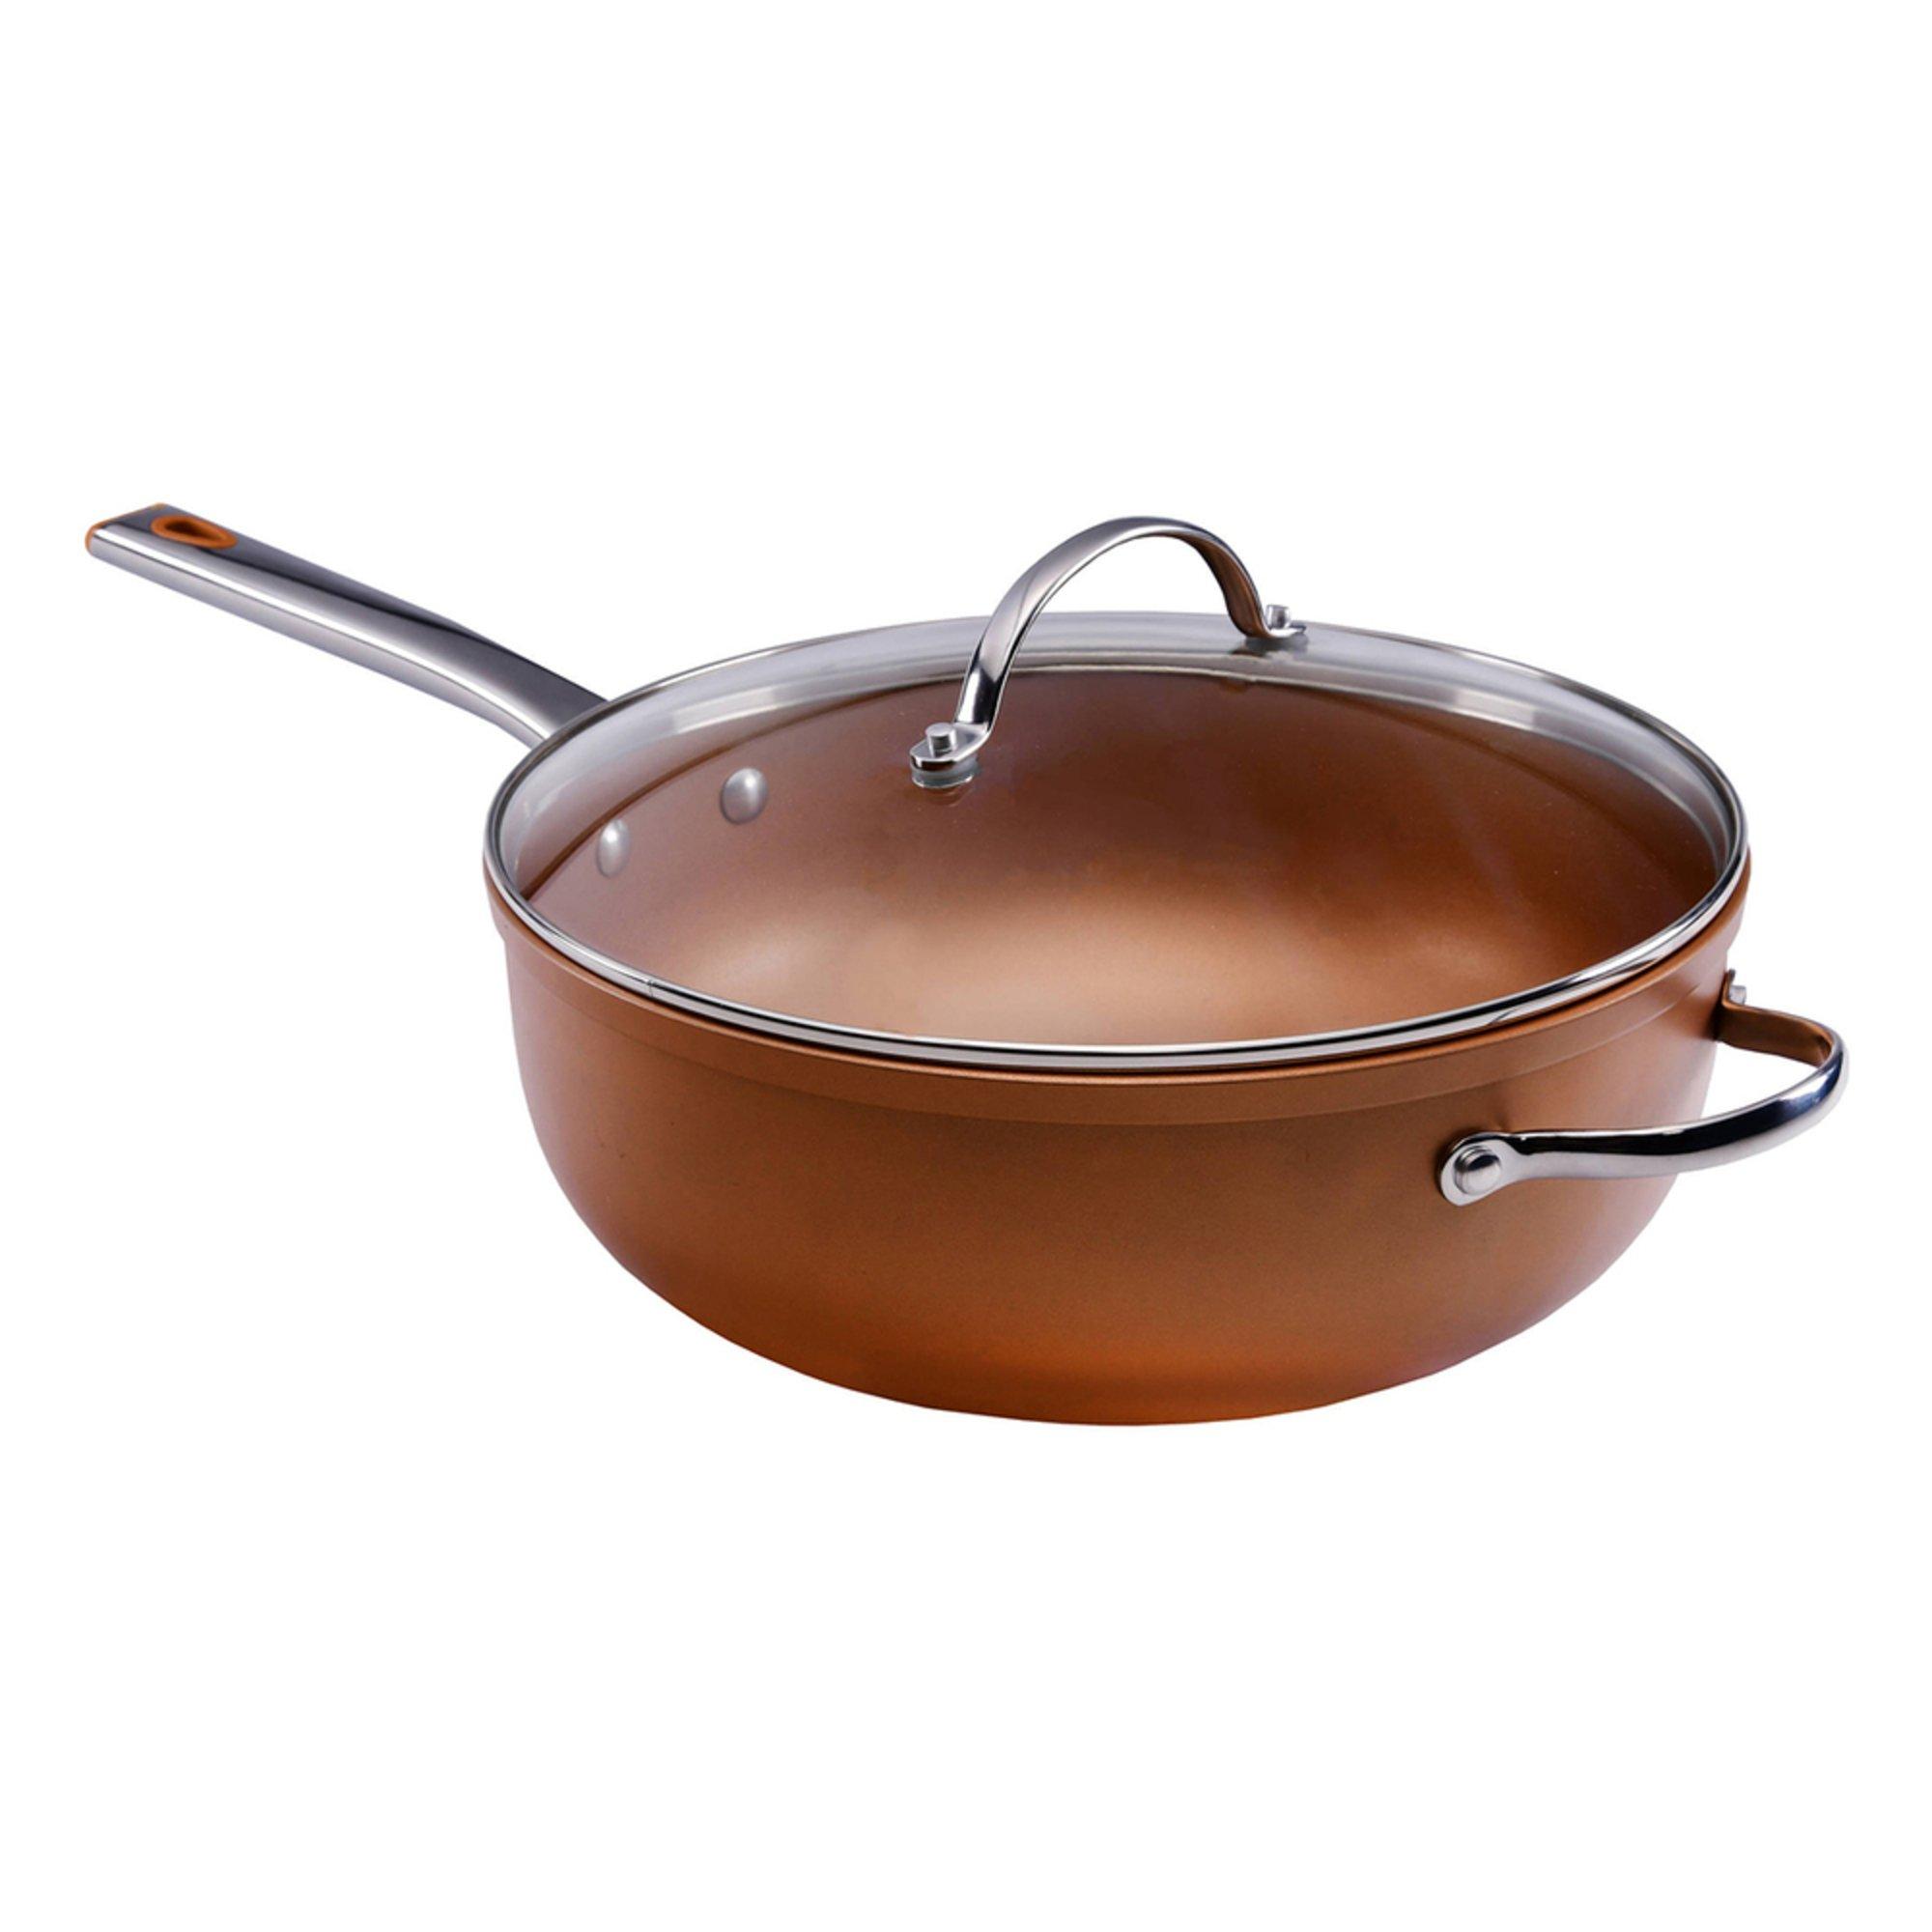 Farberware 6-quart Color Tech Covered Jumbo Cooker, Copper ...